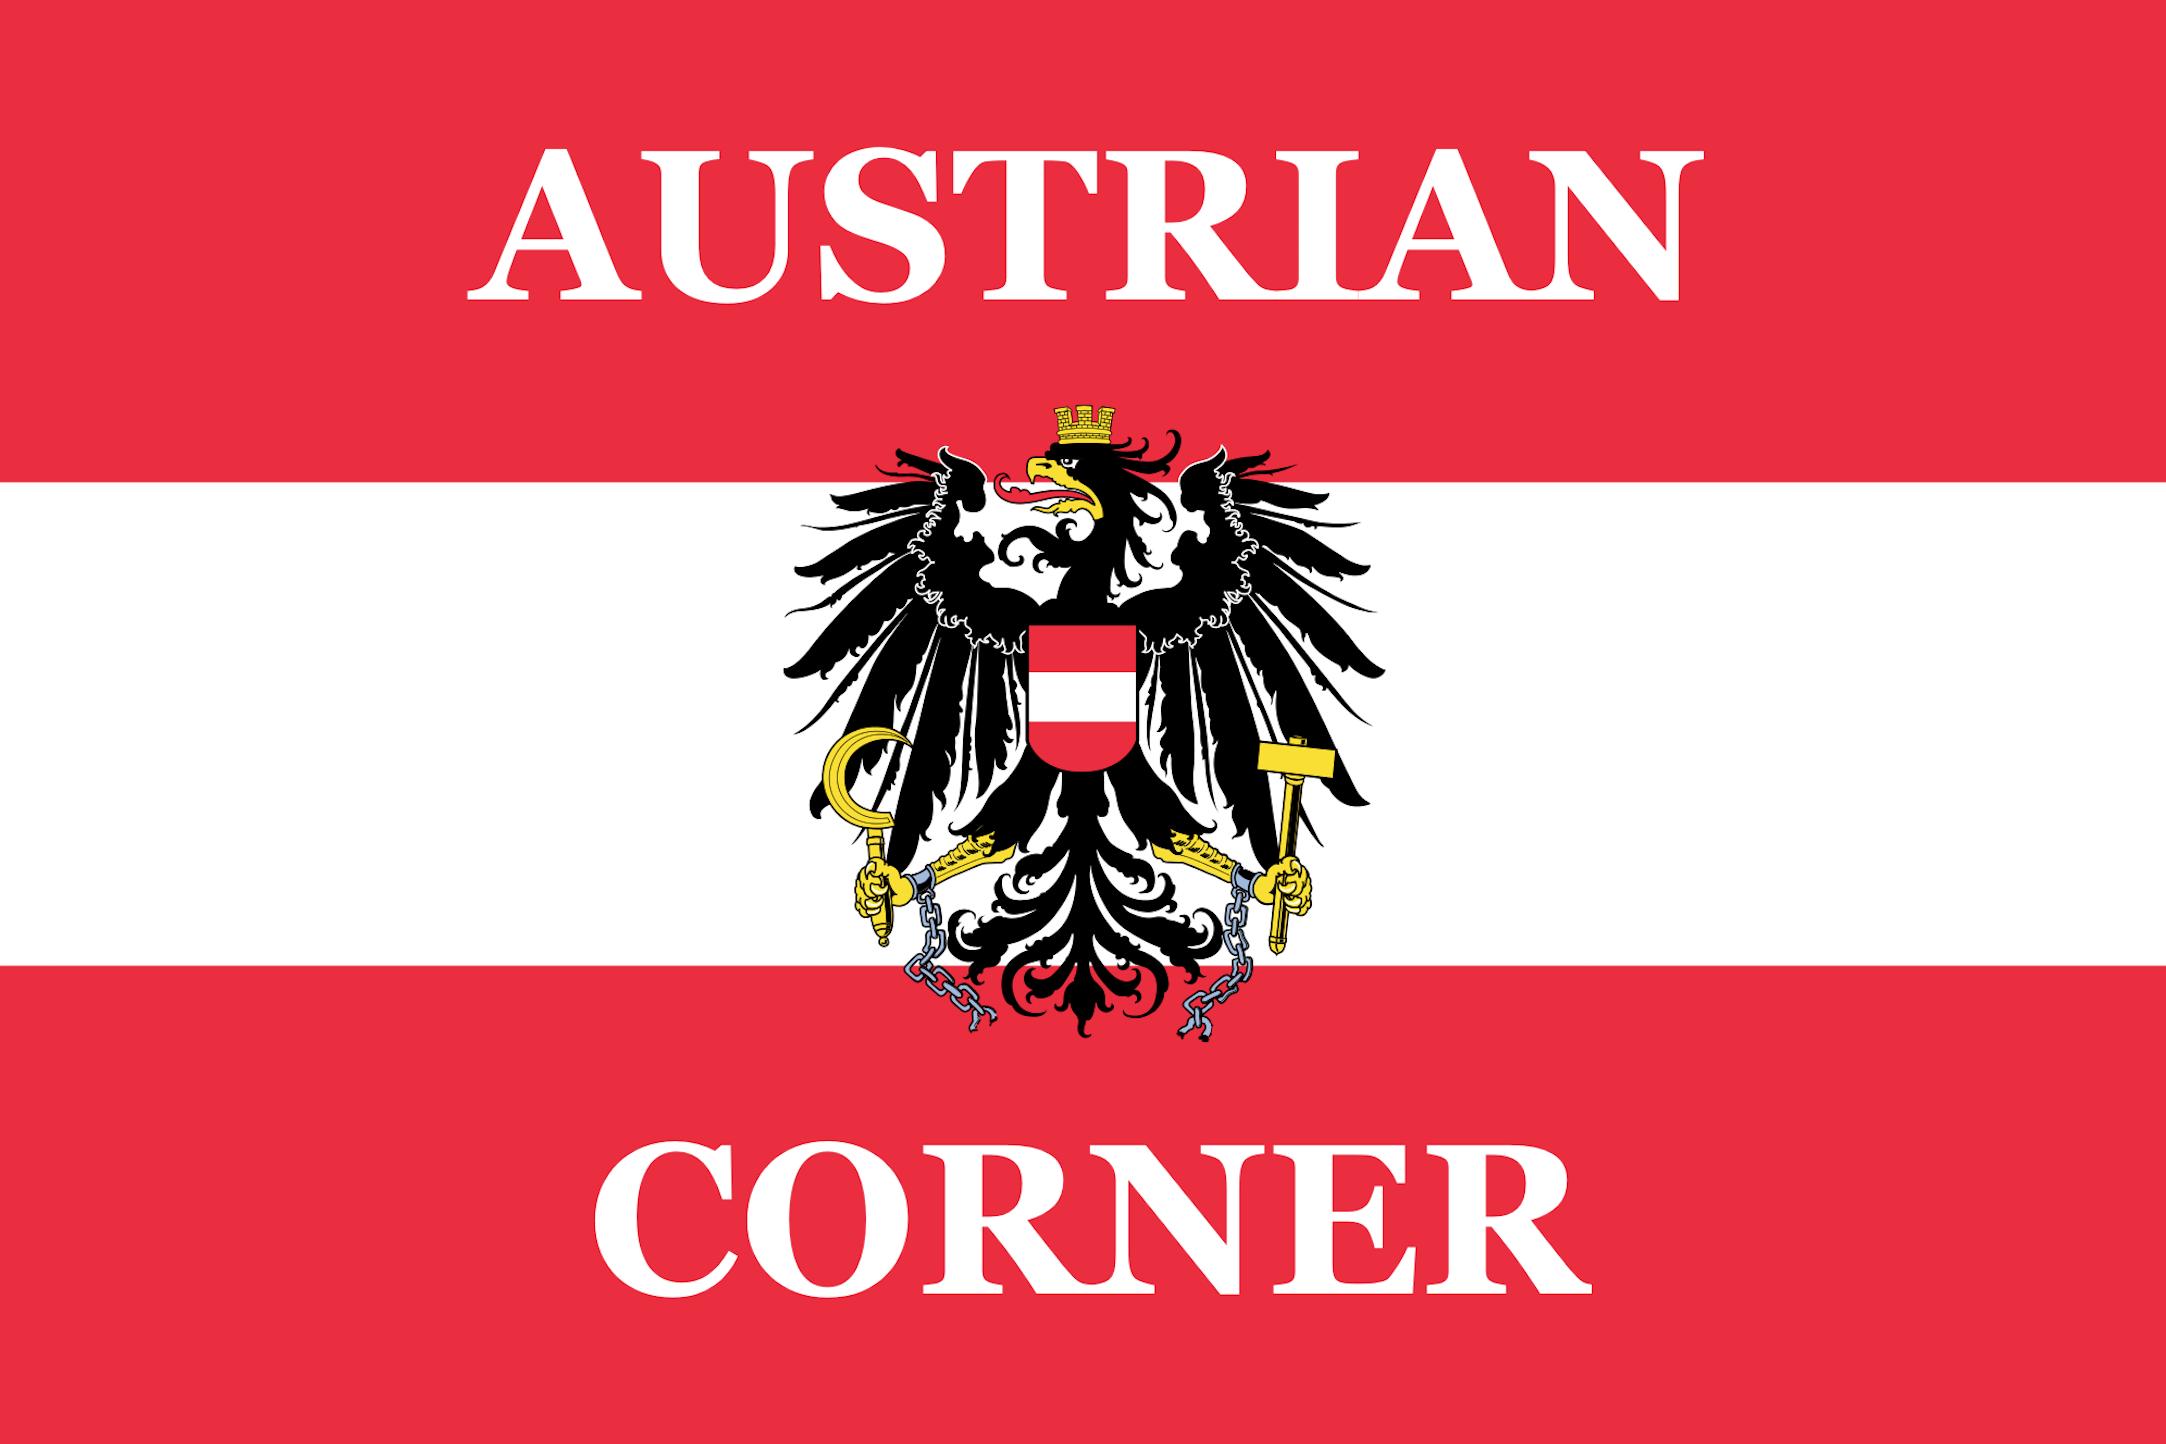 Austrian Corner